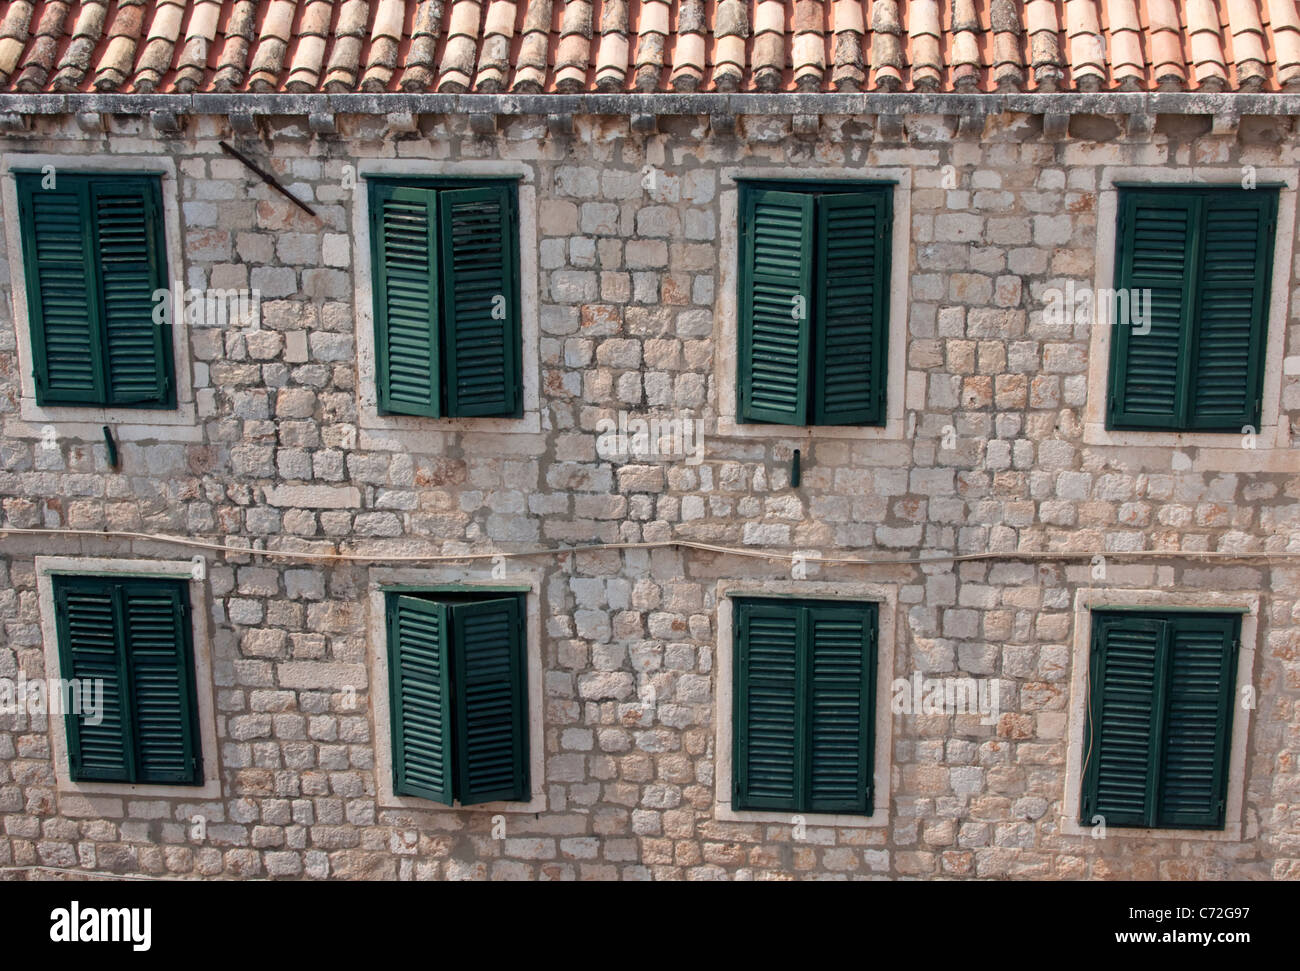 Shuttered windows - Stock Image